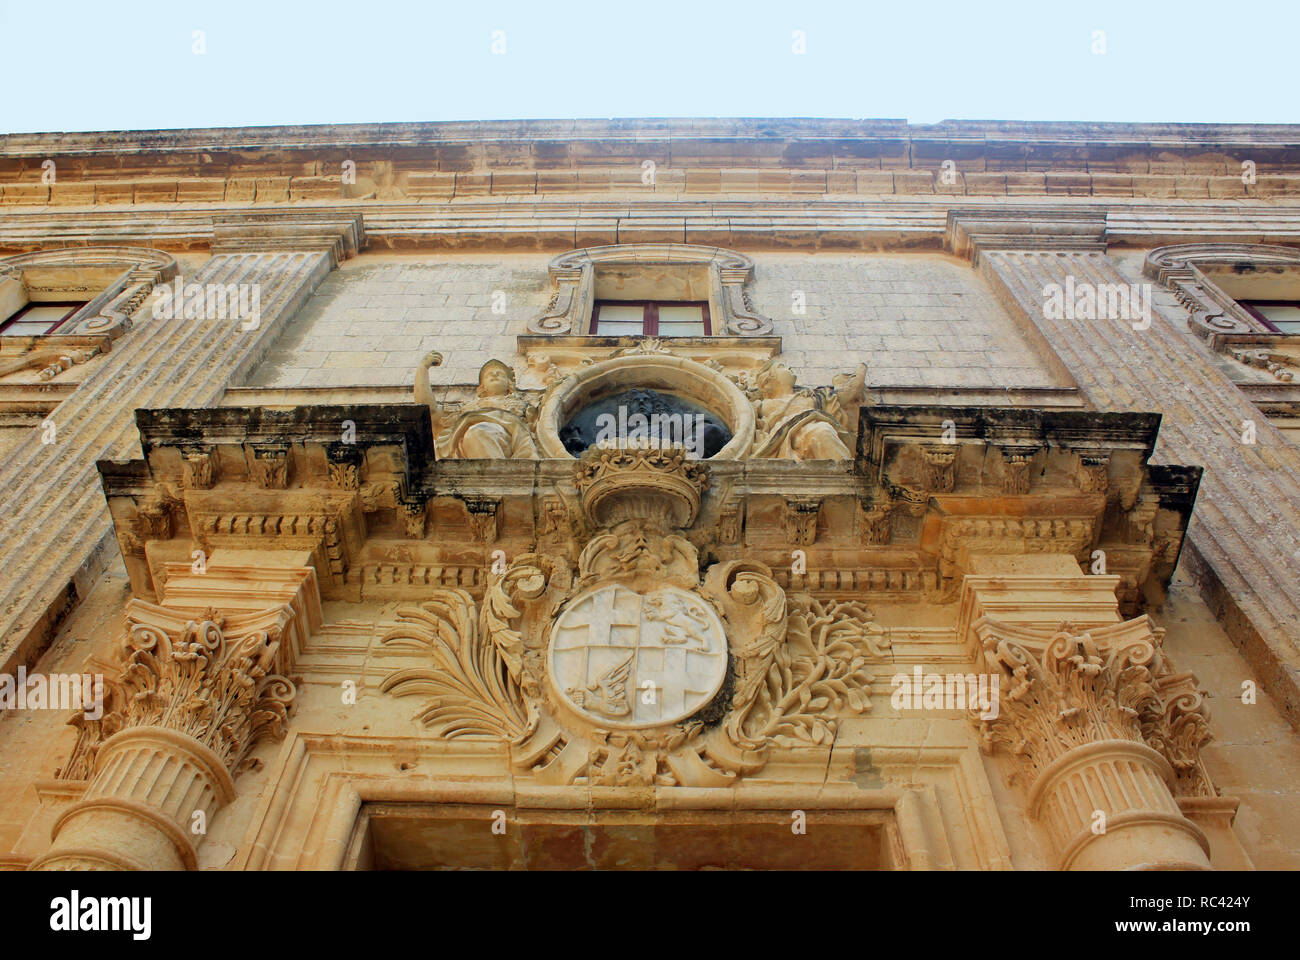 Vilhena Palace in Mdina, Malta, Museum of Natural History - Stock Image